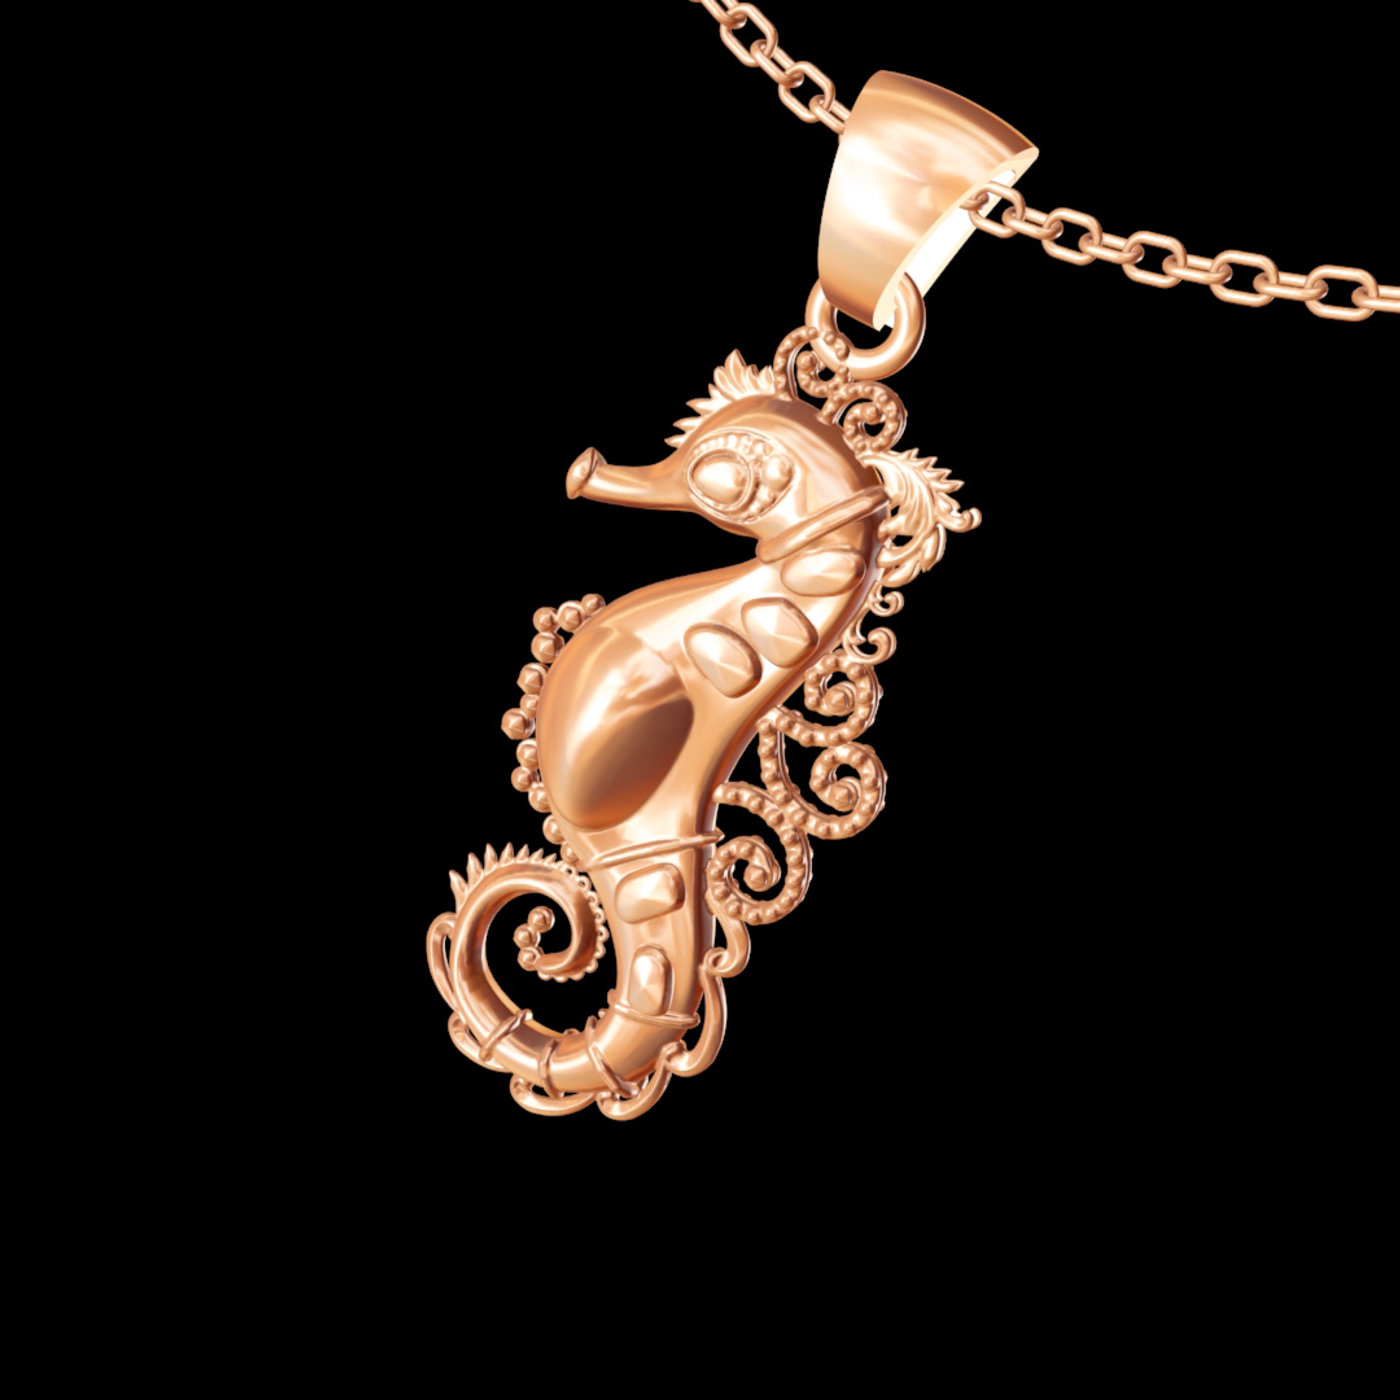 Seahorse Sculpture pendant jewelry gold necklace 3D print model